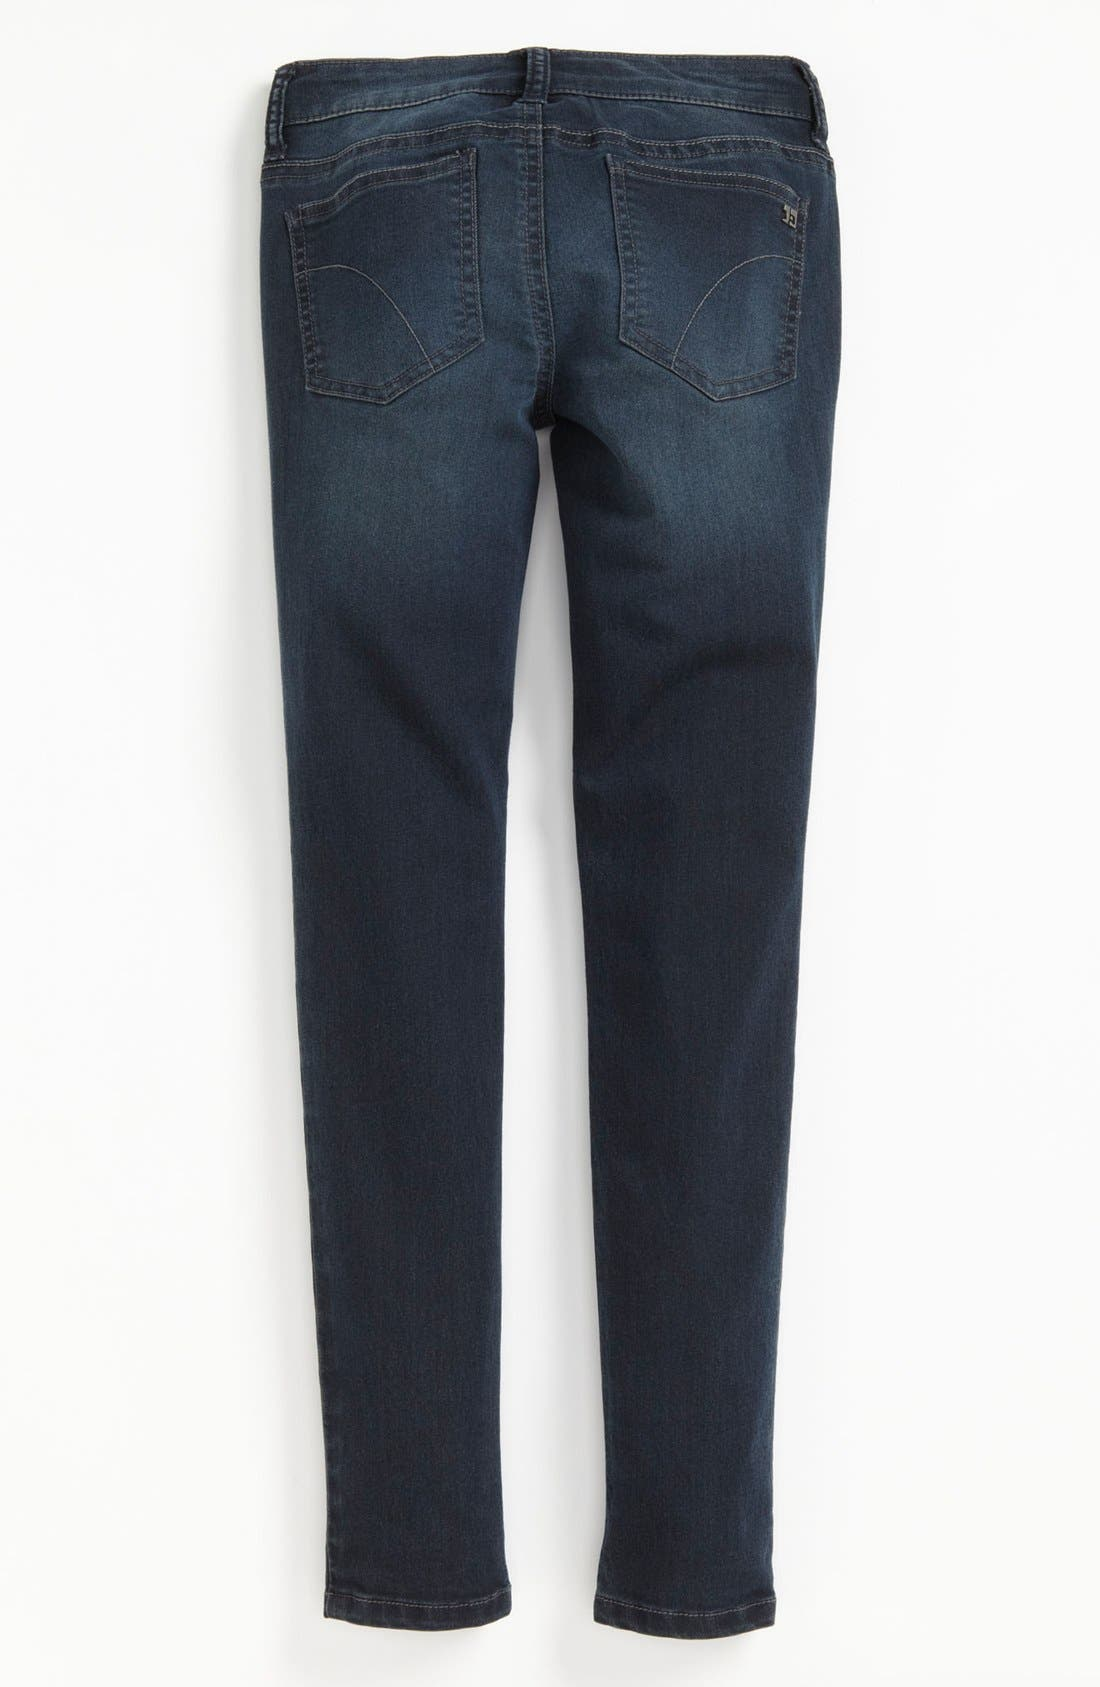 Alternate Image 1 Selected - Joe's 'Ryan' Skinny Jeans (Big Girls)